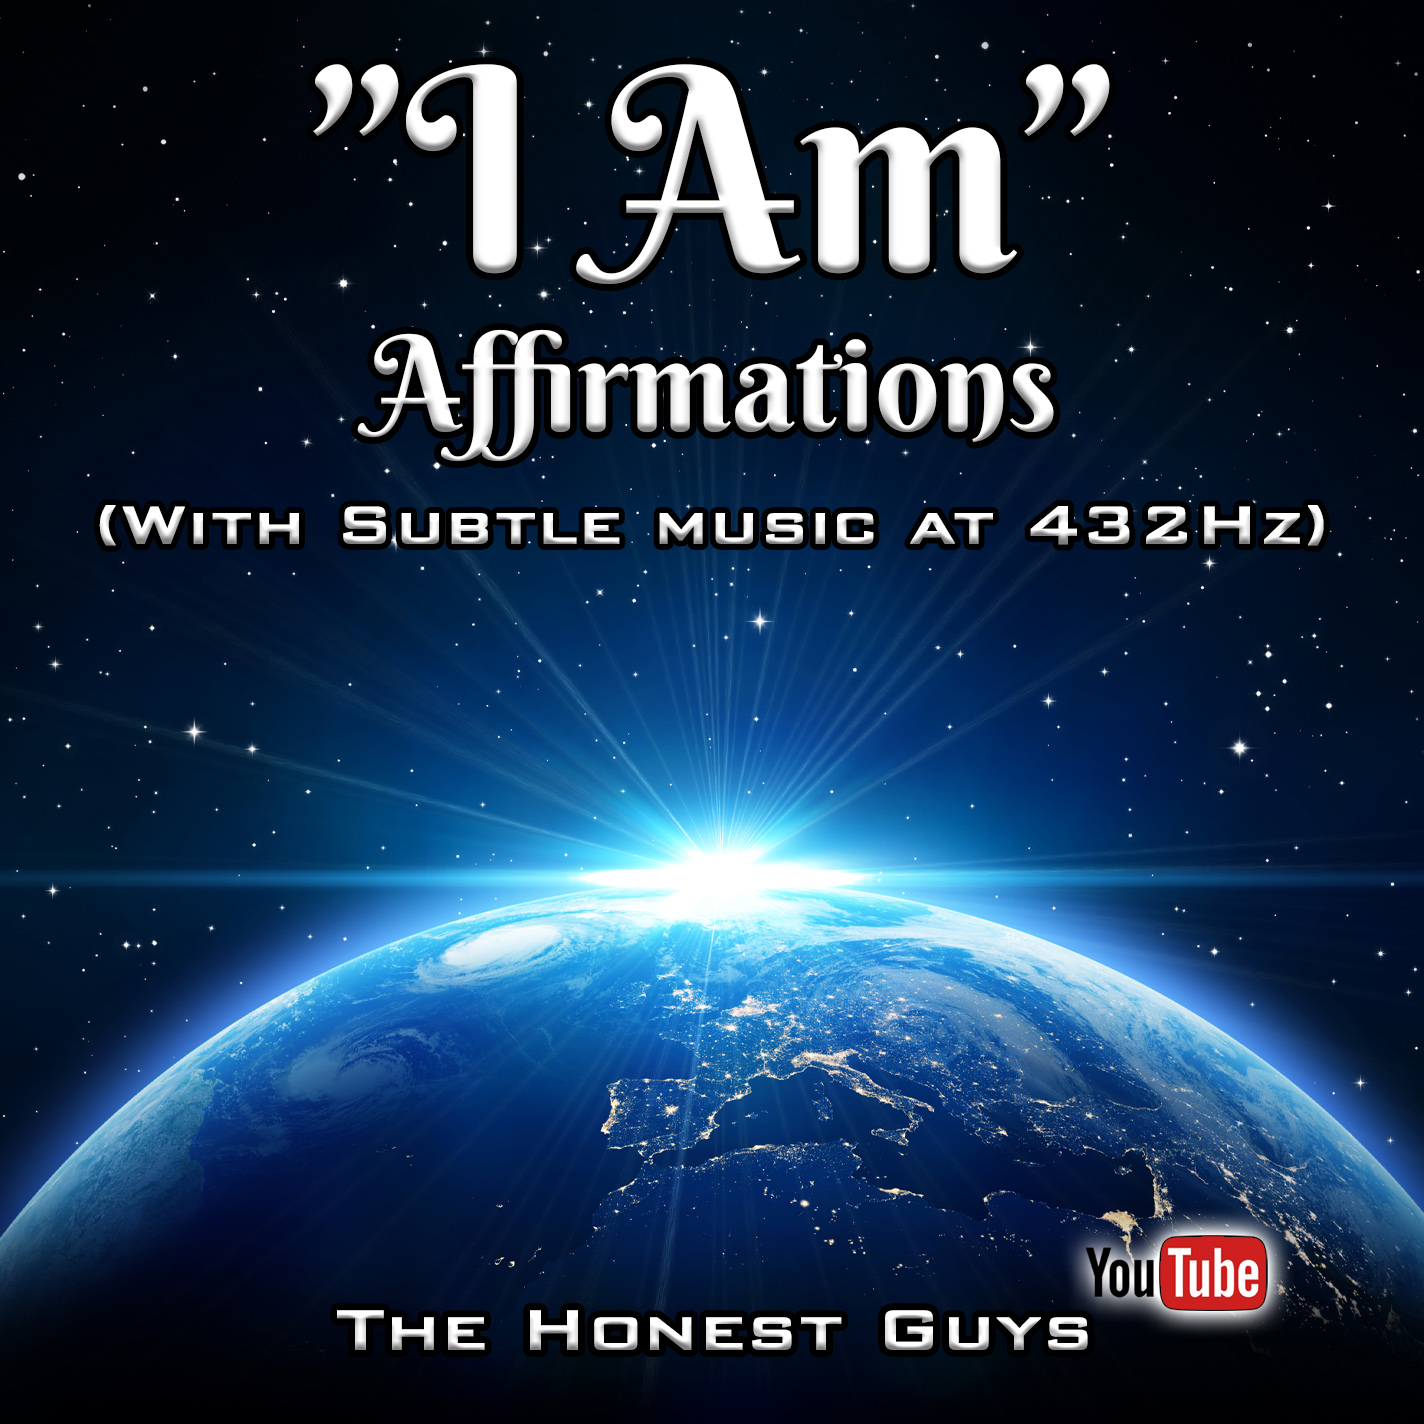 MP3: 'I AM' AFFIRMATIONS (With Subtle Music) 432Hz - Digital Download —  TheHonestGuys co uk